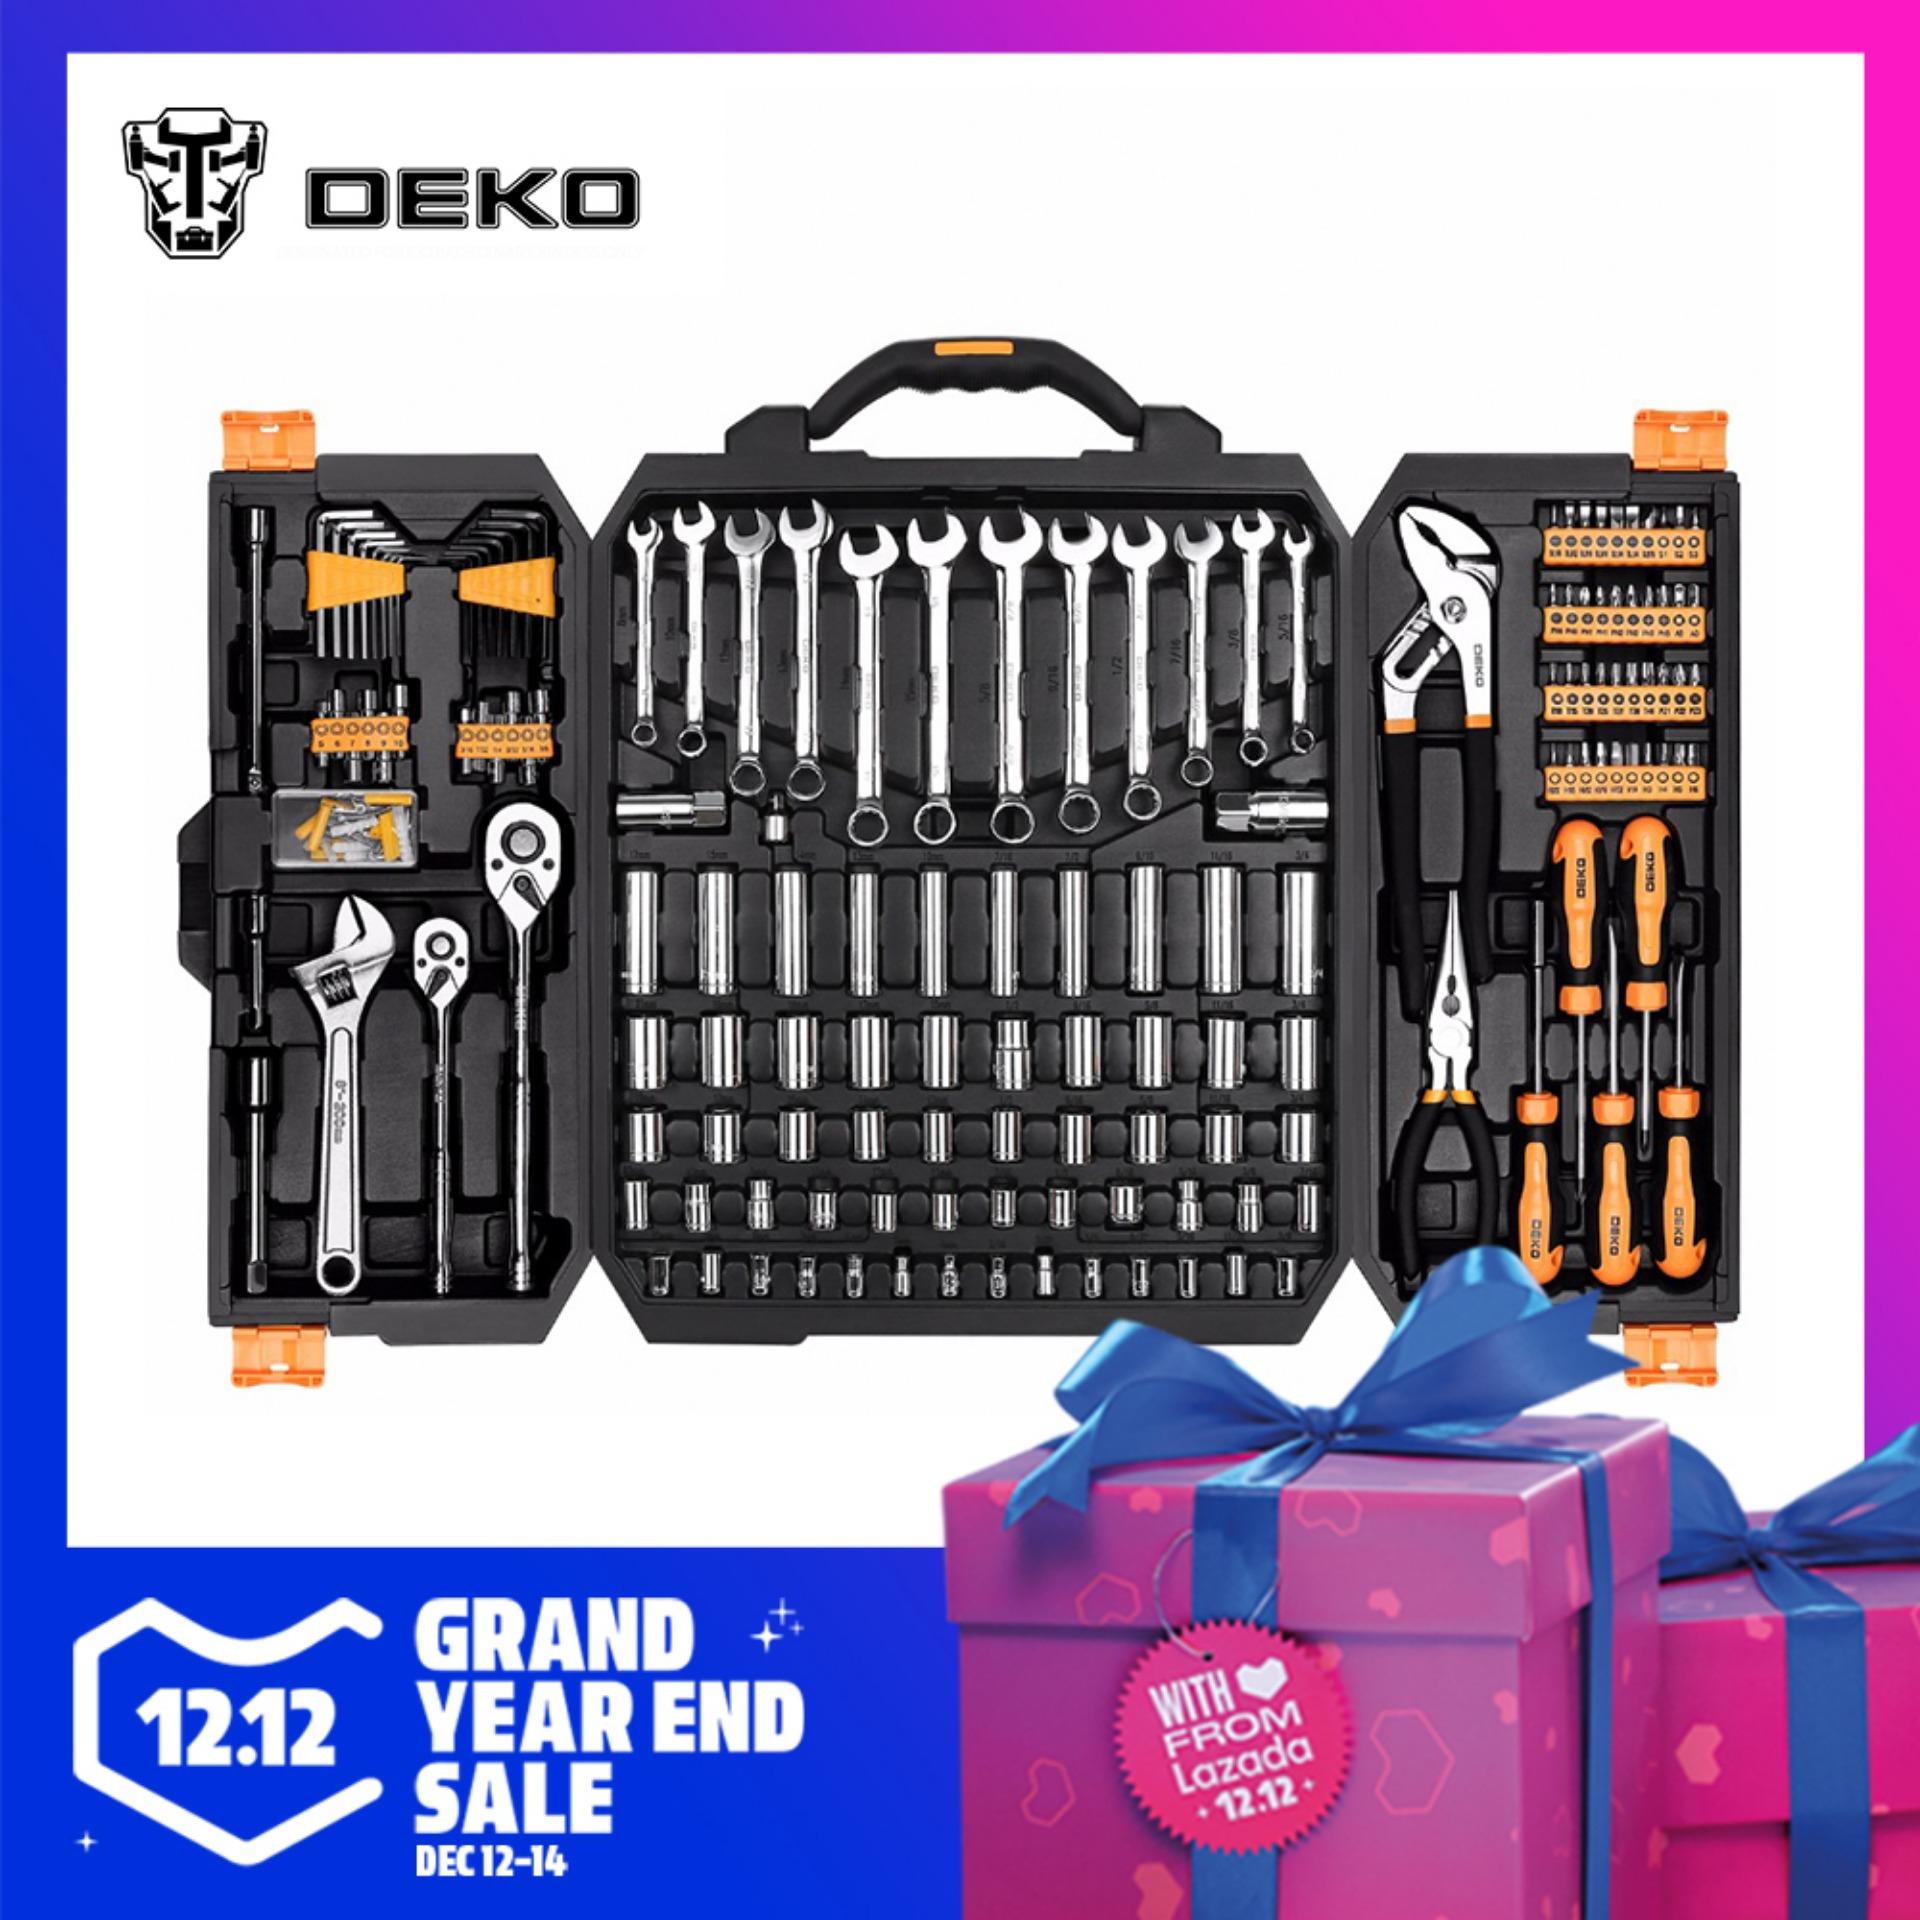 DEKO 192 Pcs Professional Car Repair Tool Set Auto Ratchet Spanner Screwdriver Socket Mechanics Tools Kit W/ Blow-Molding Box